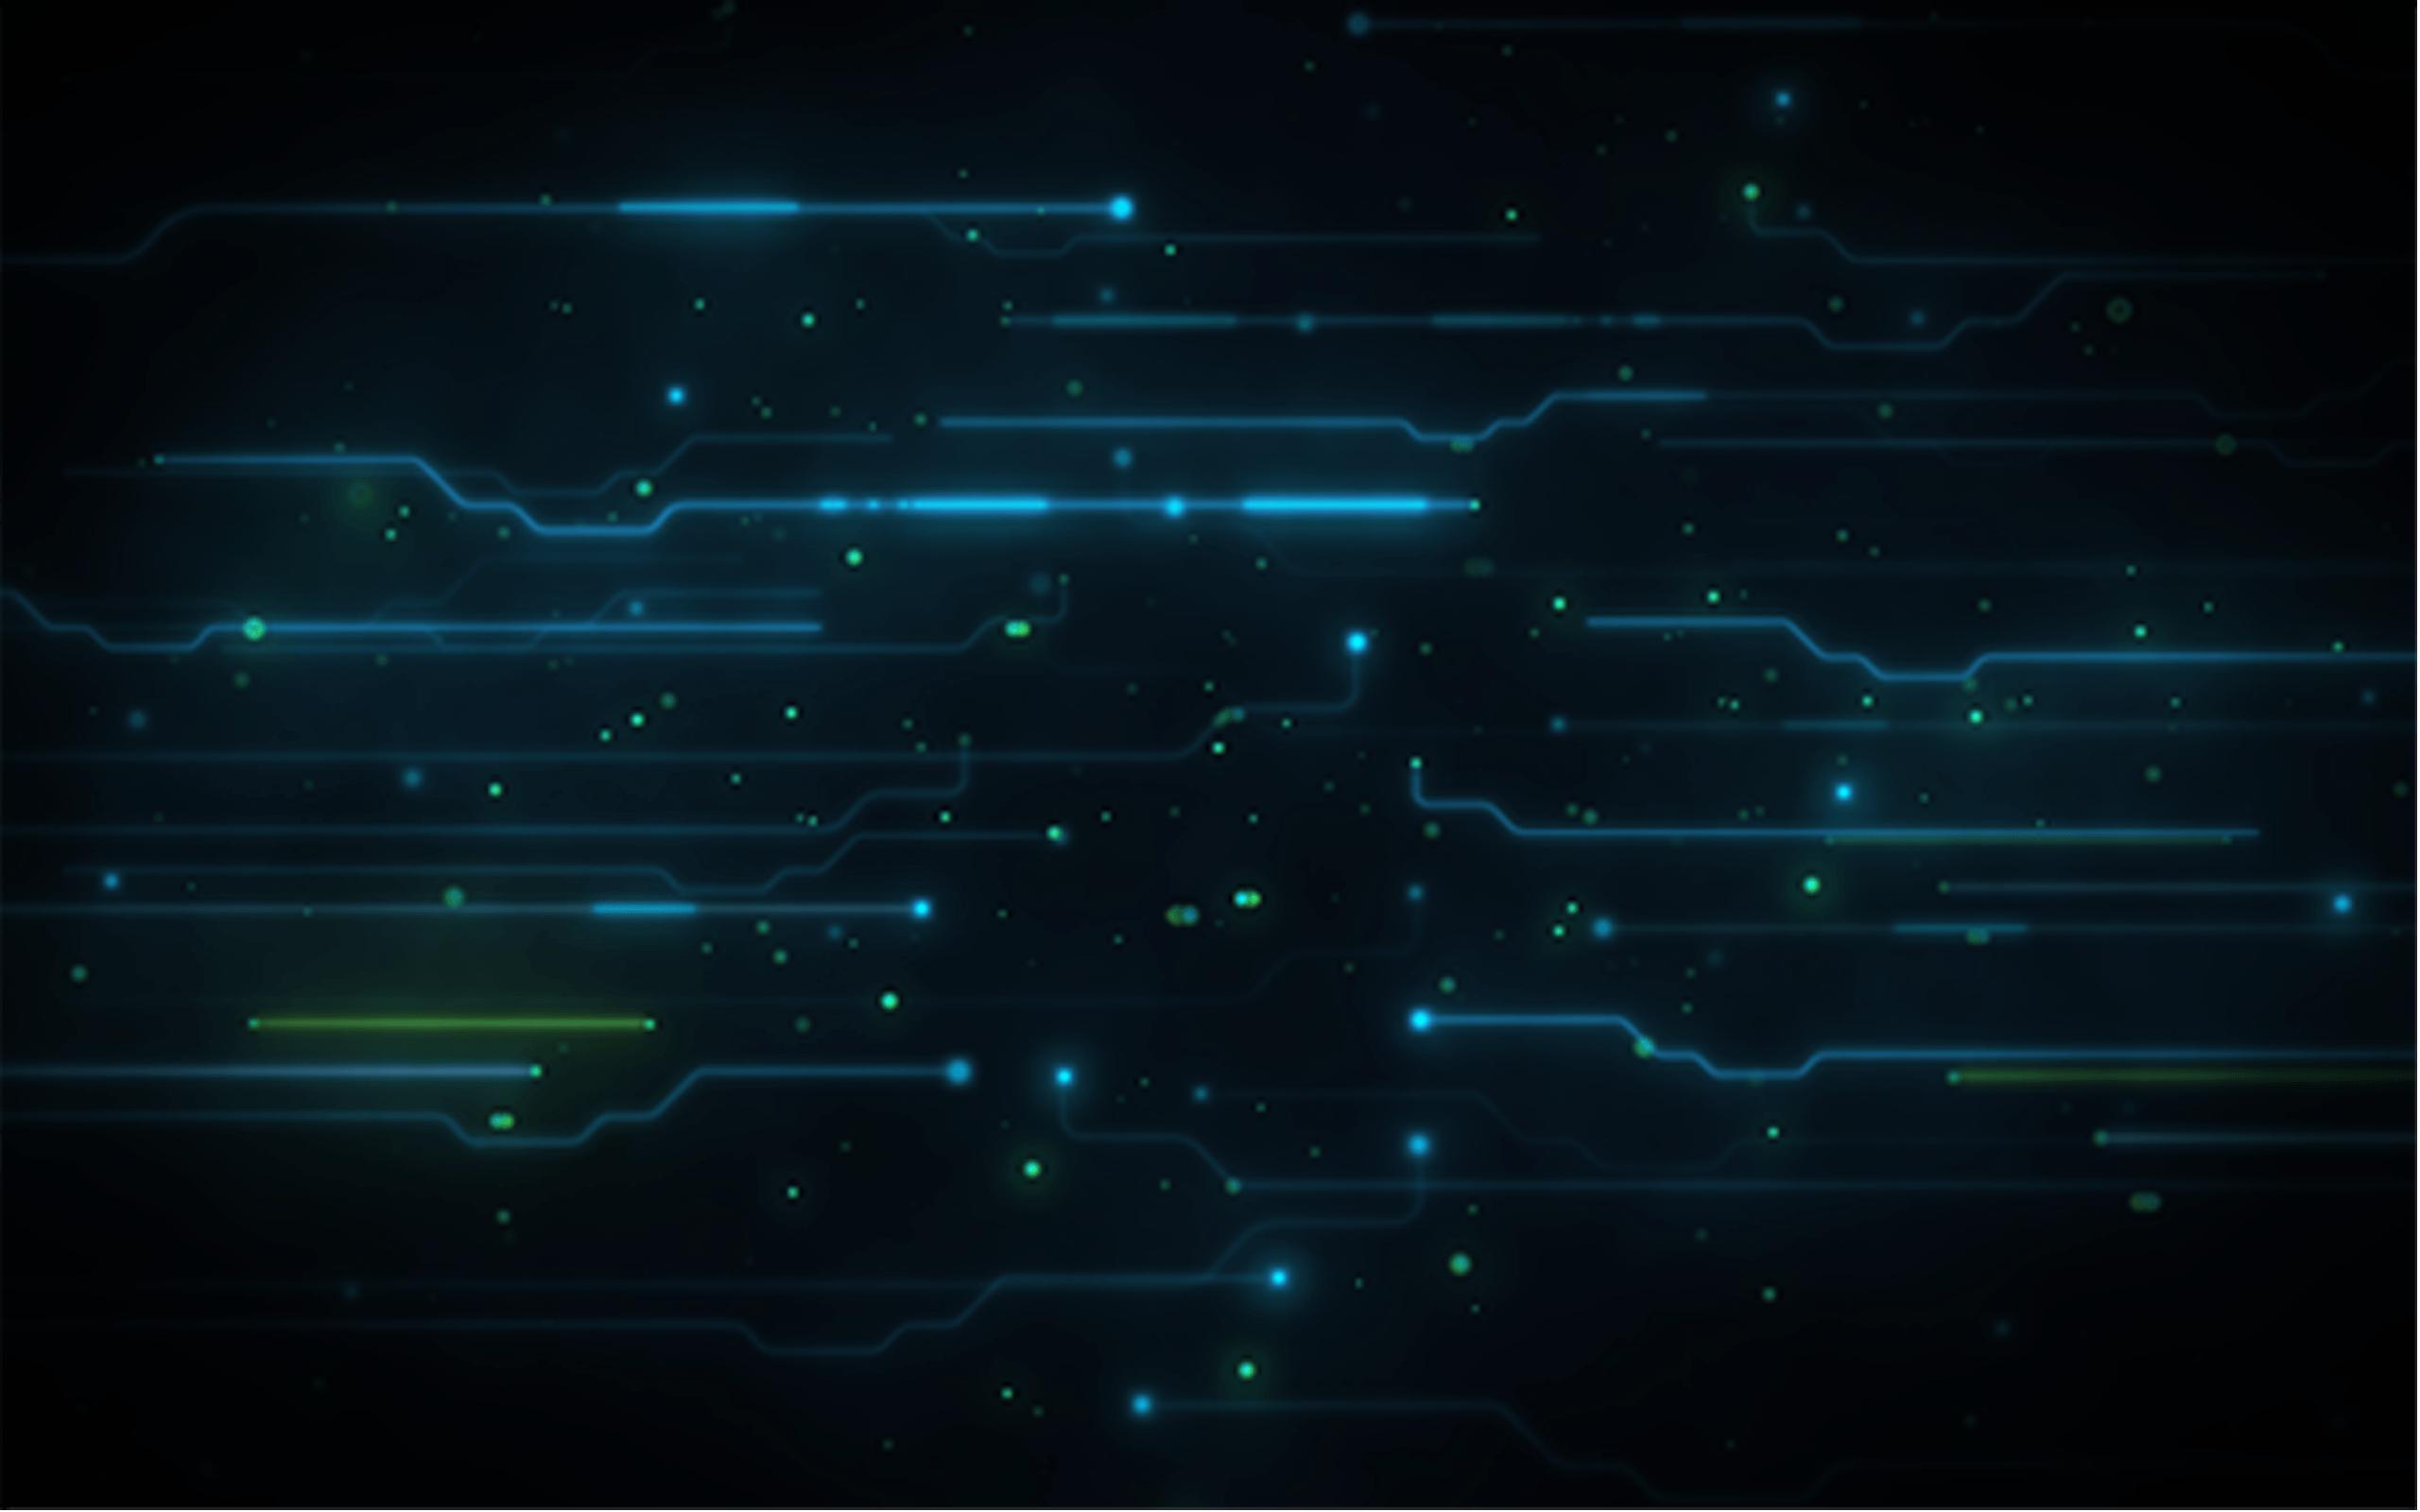 4K Tech Wallpaper